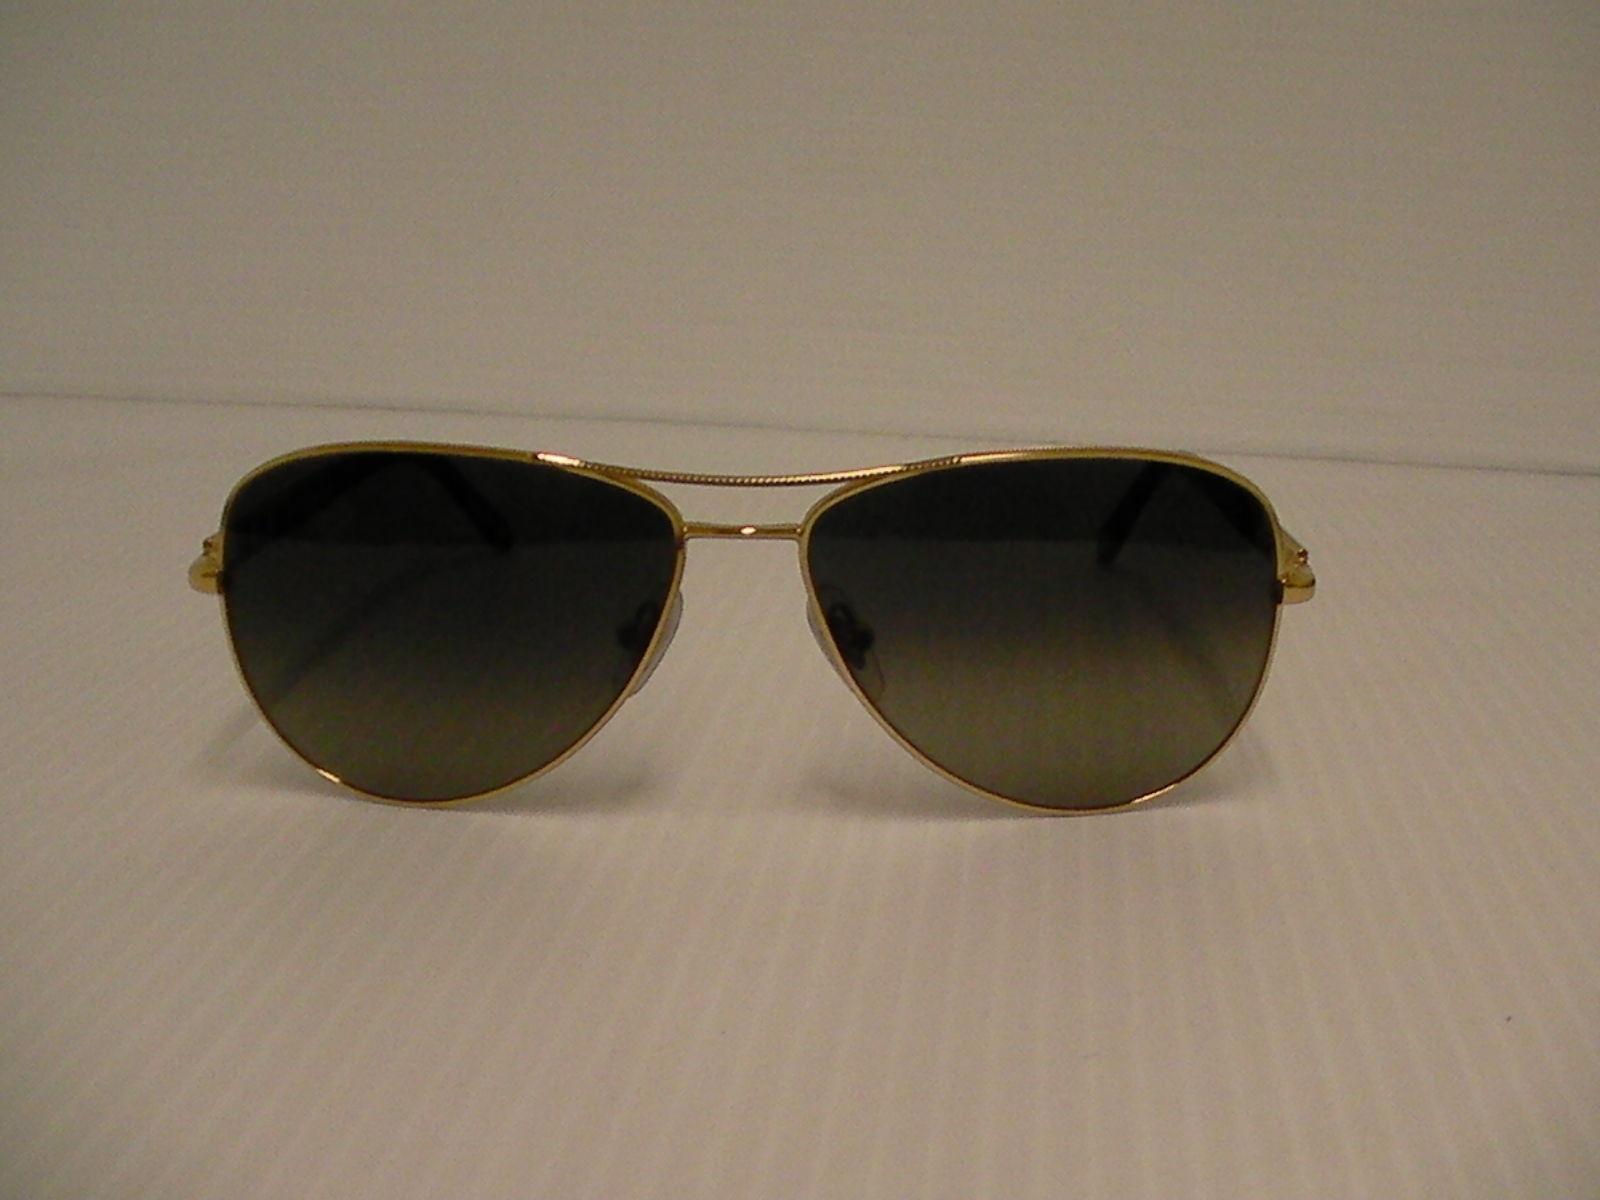 67c124b348 Authentic tiffany sunglasses TF 3047-K gold and 39 similar items. 57